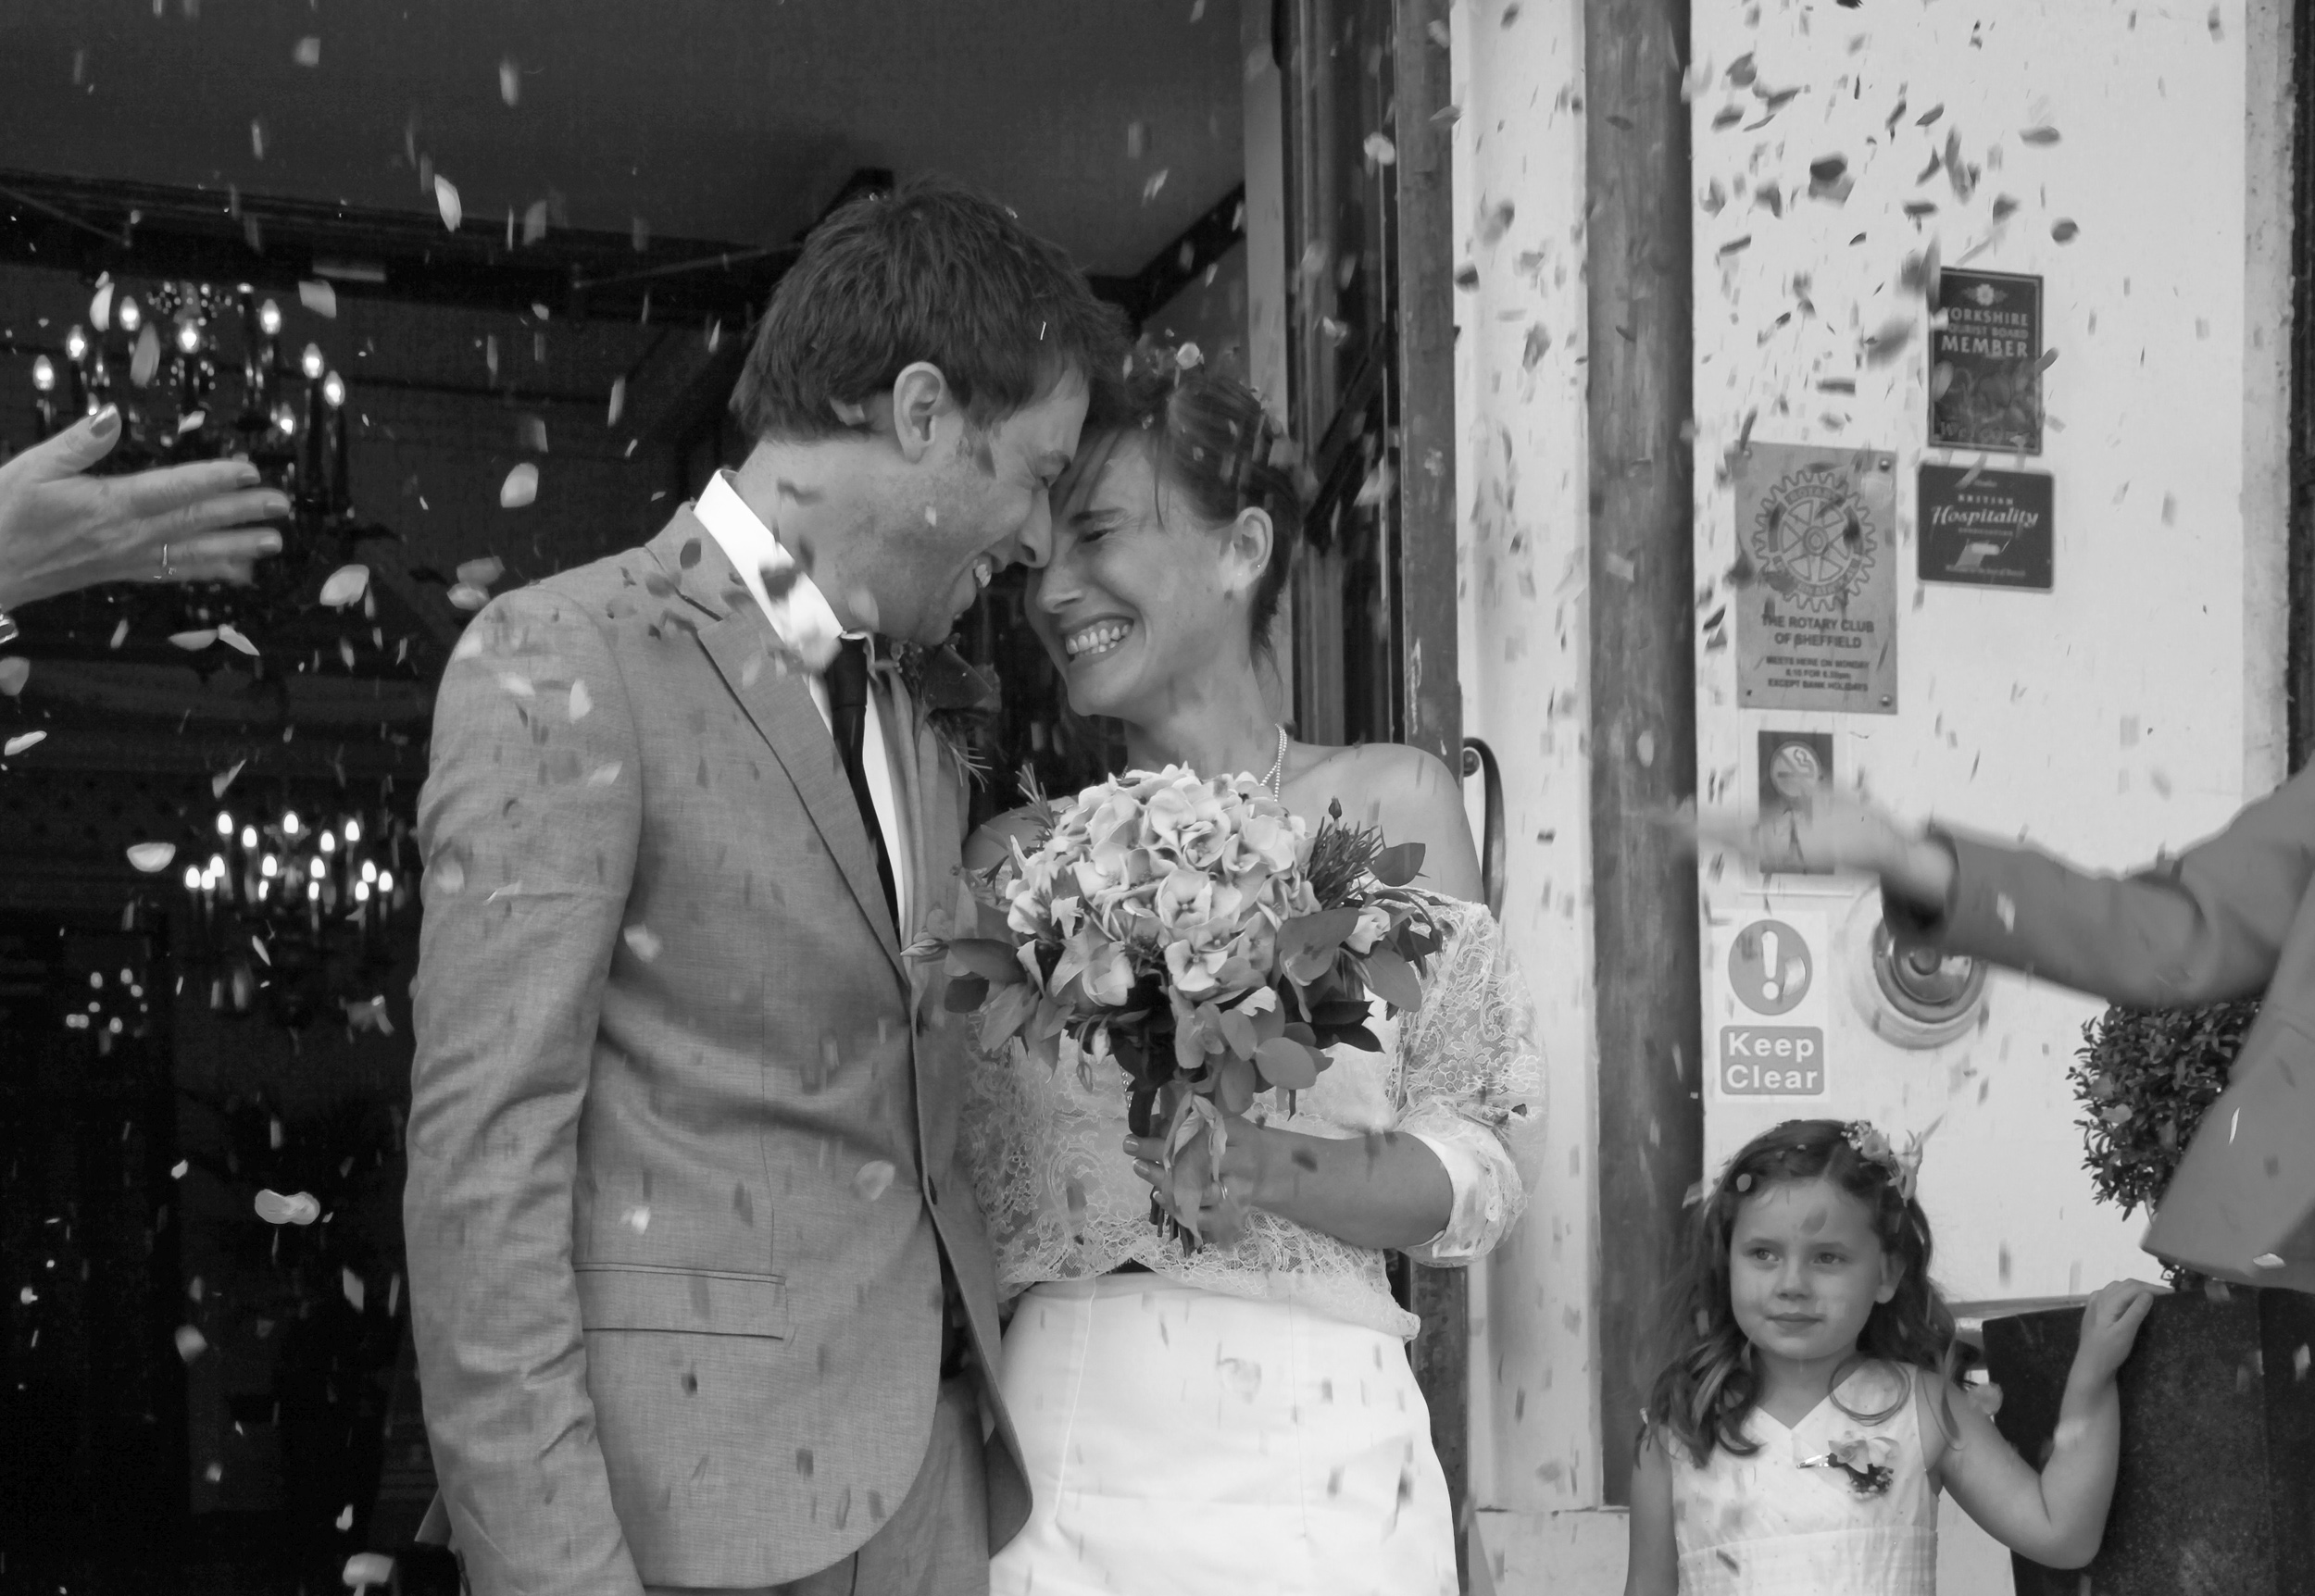 Alexandra-bespoke-wedding-dress-Kate-Beaumont-12.jpg